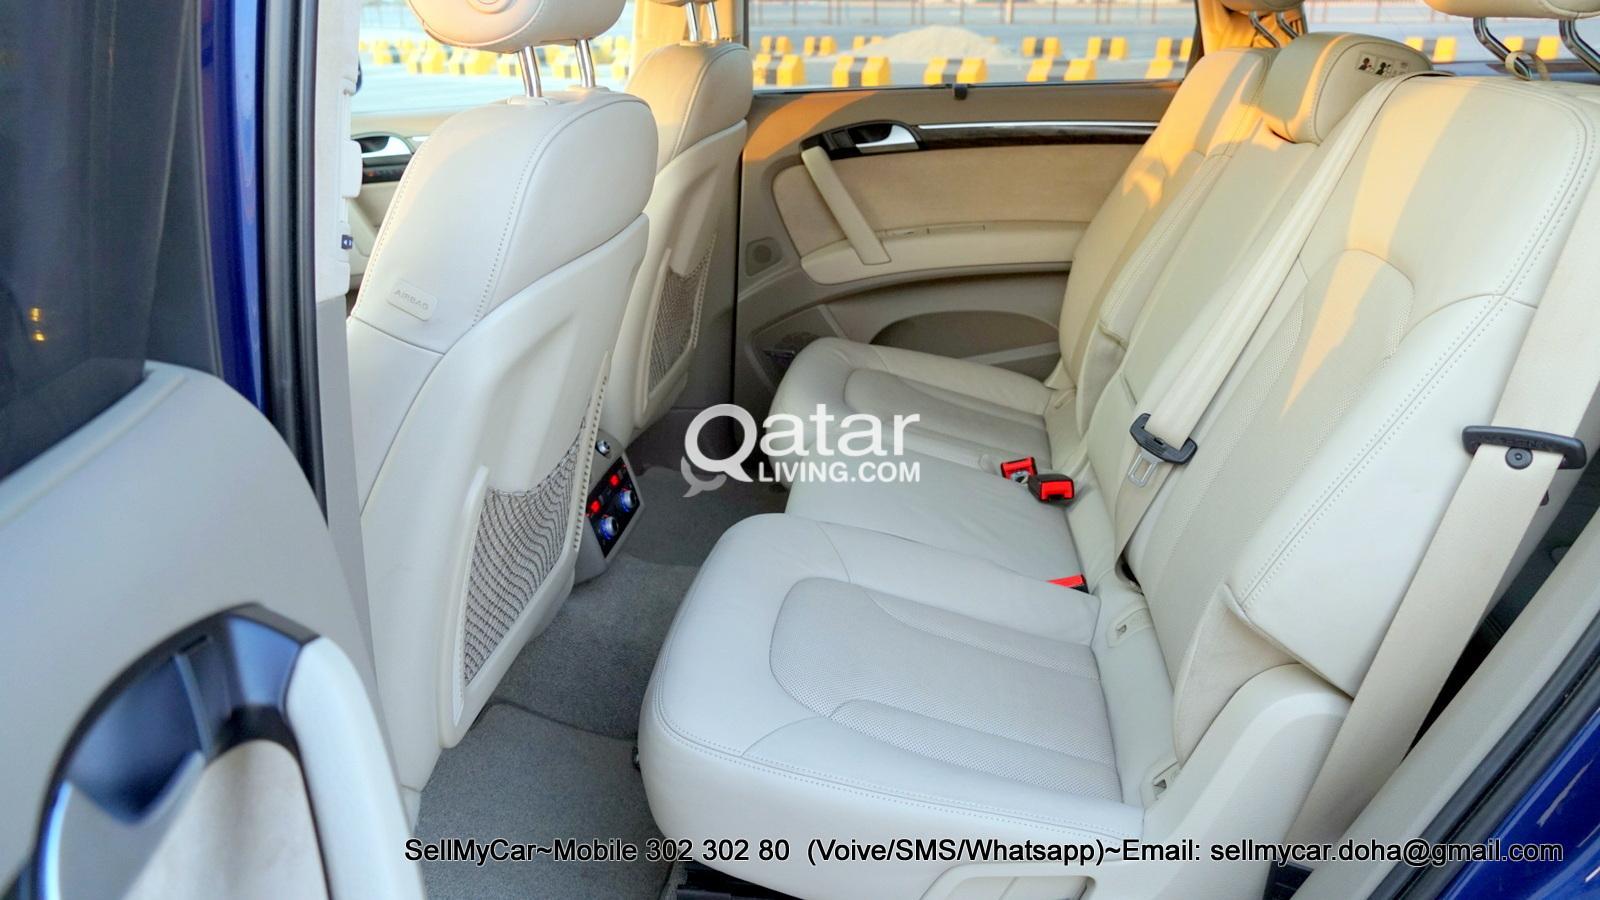 2015 Audi Q7 S-Line Audi (7-Passenger) Many Photos